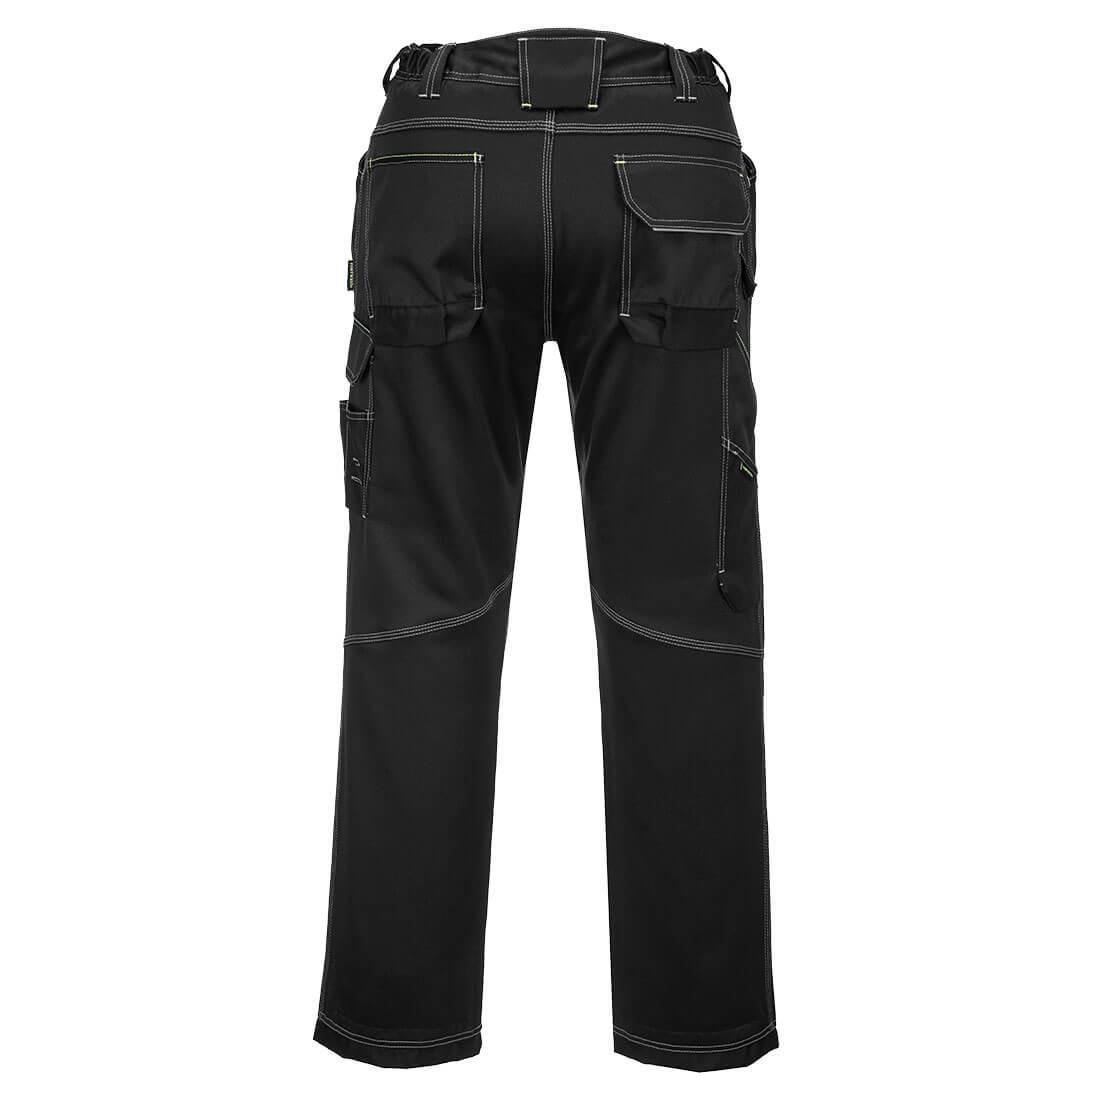 Pantaloni Stretch Usori PW3 - Imbracaminte de protectie